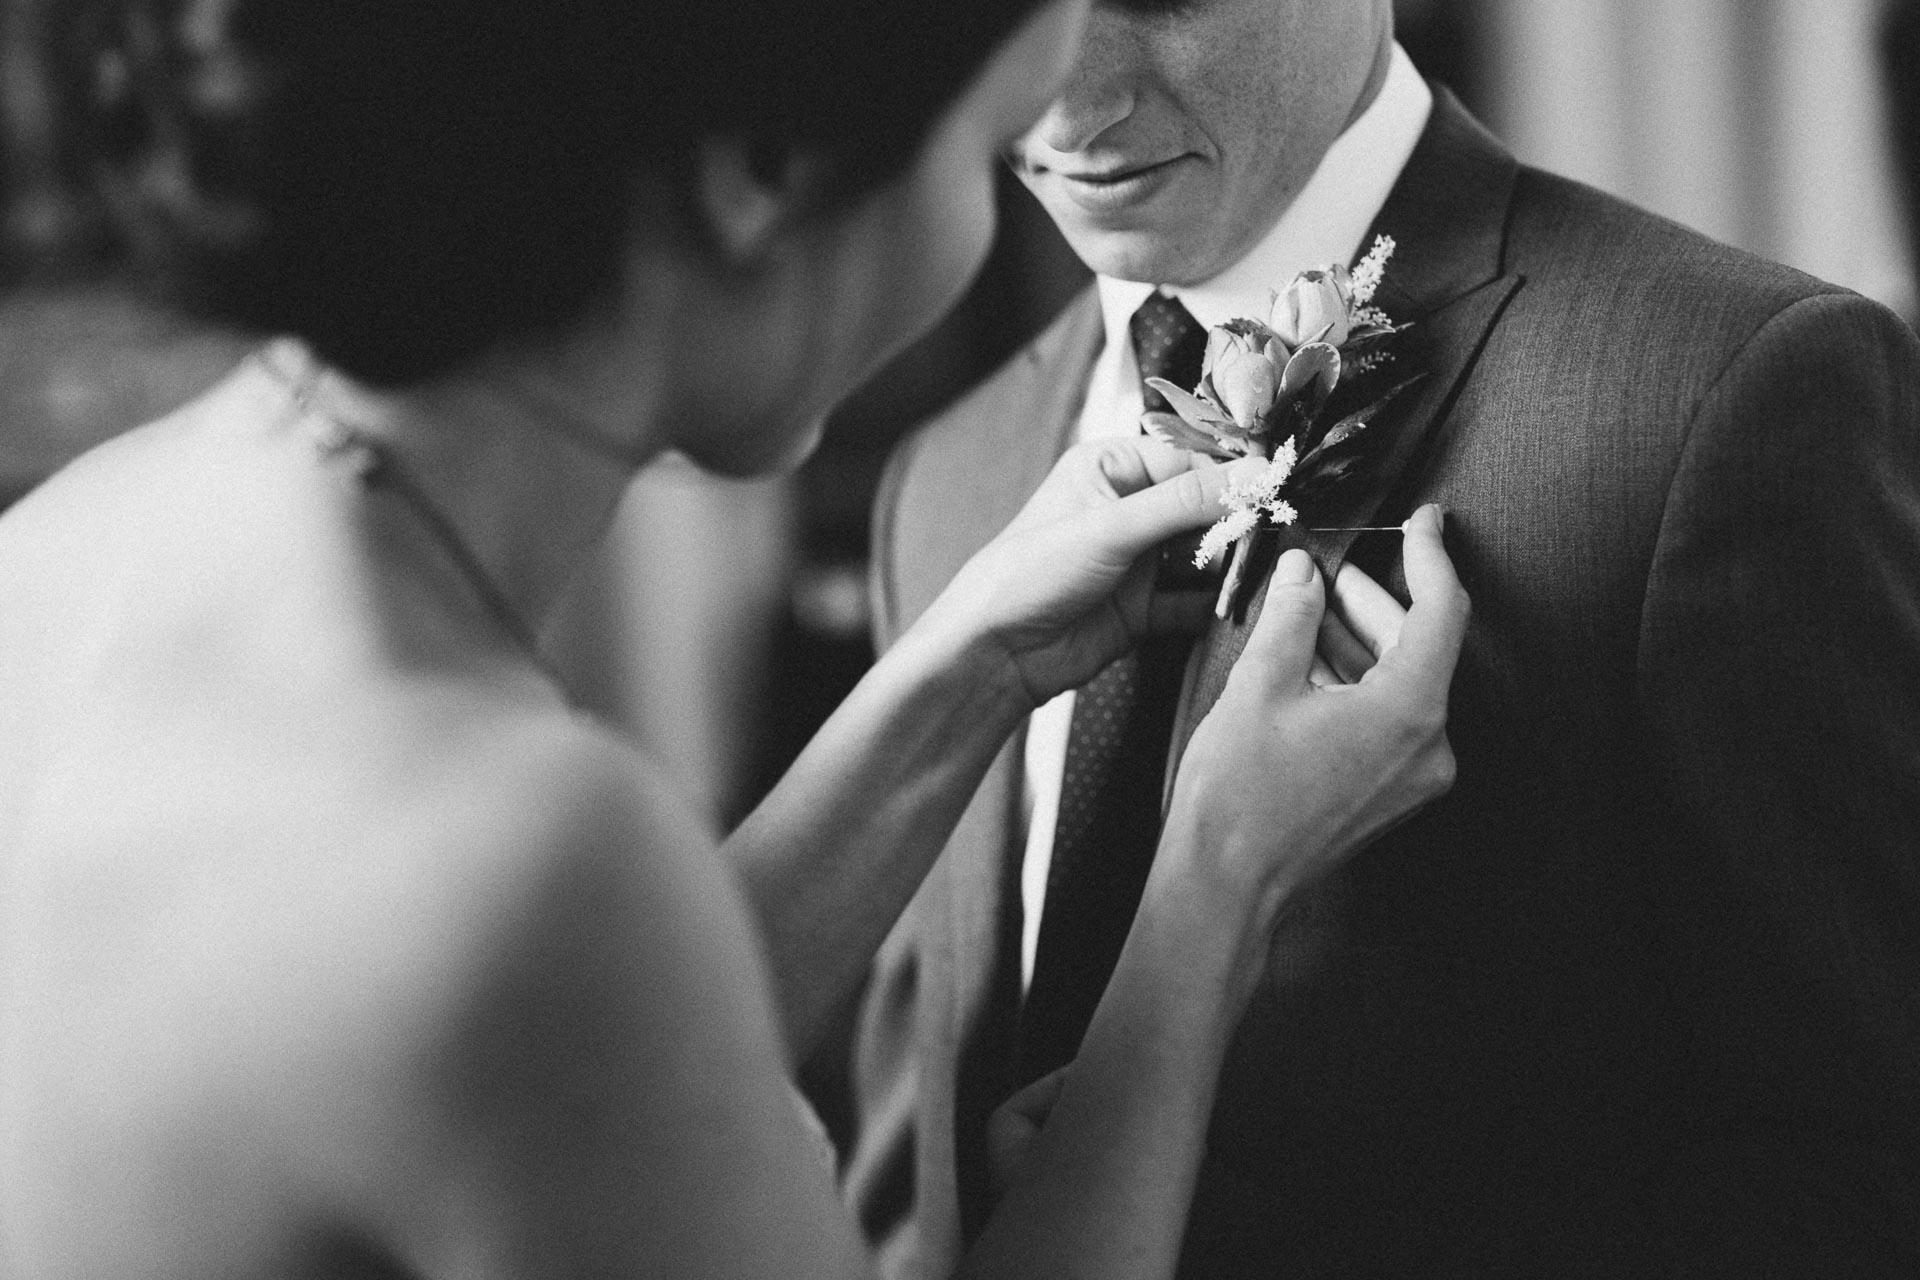 Julia-Michael-Cincinnati-Music-Hall-Wedding-048@2x.jpg